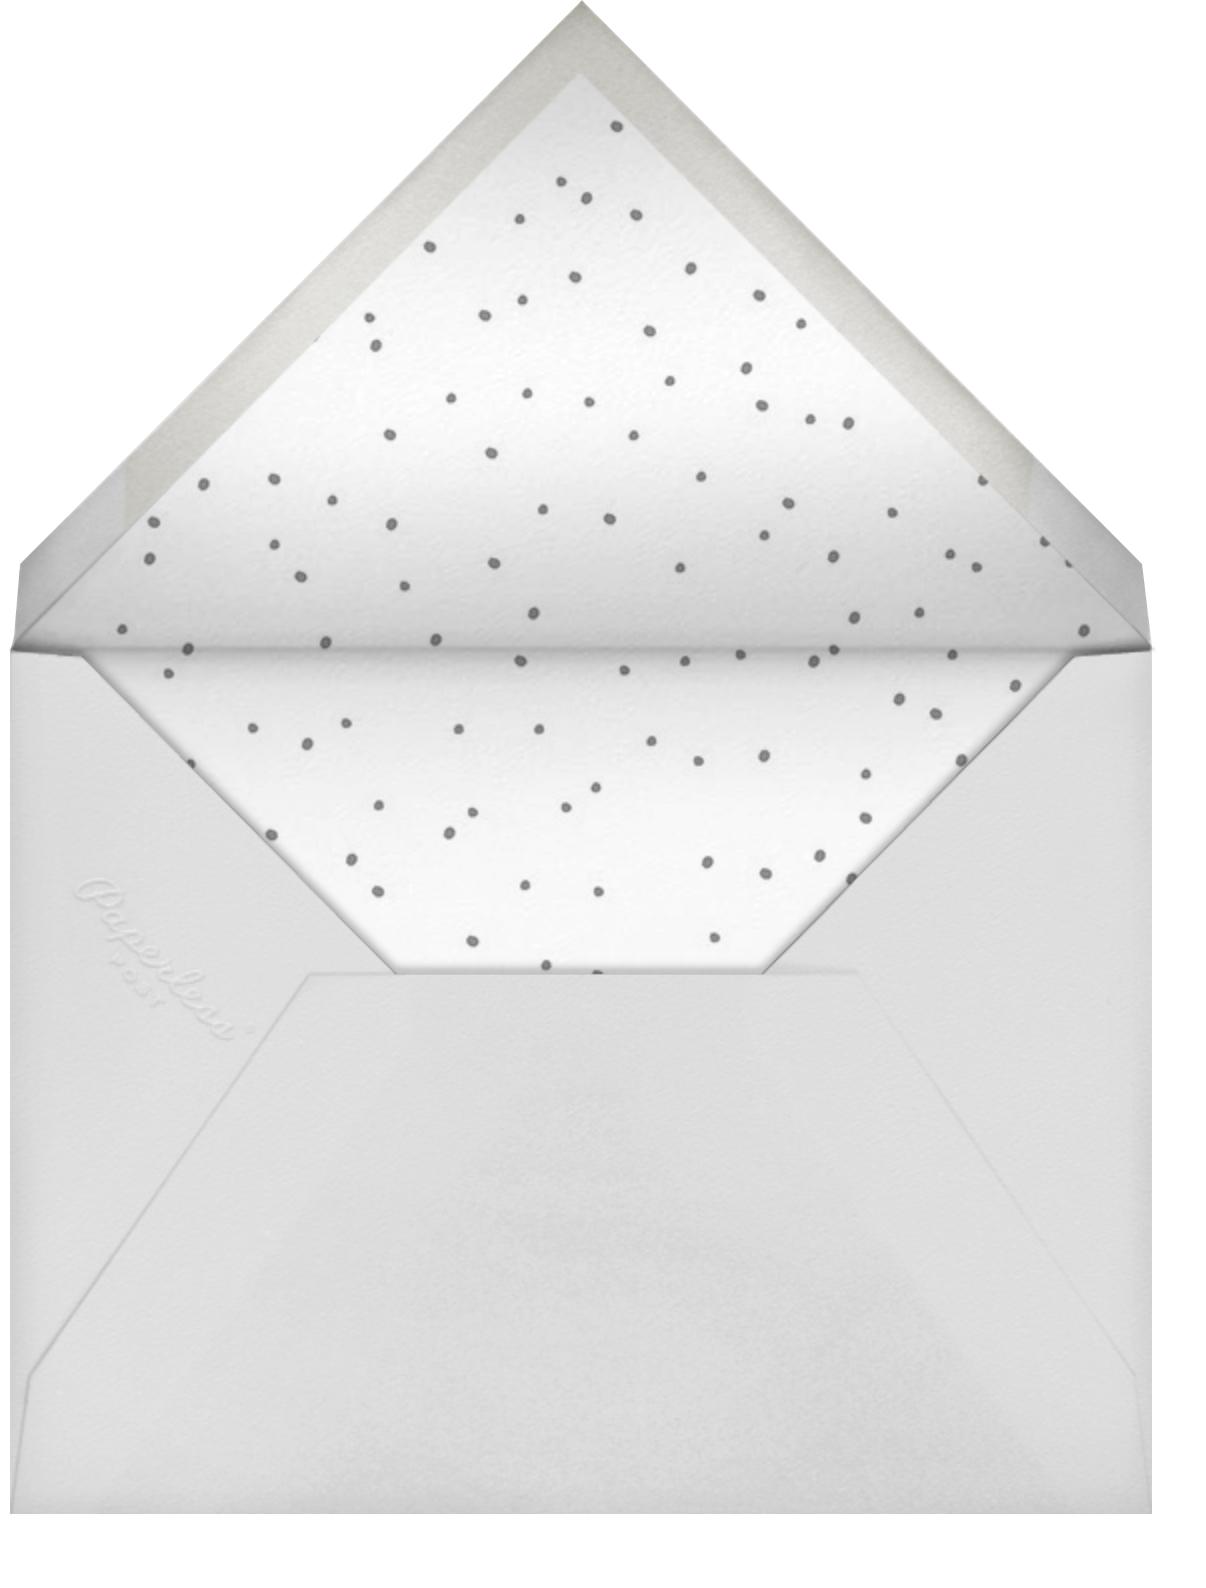 Ficus - Gray - Linda and Harriett - All - envelope back